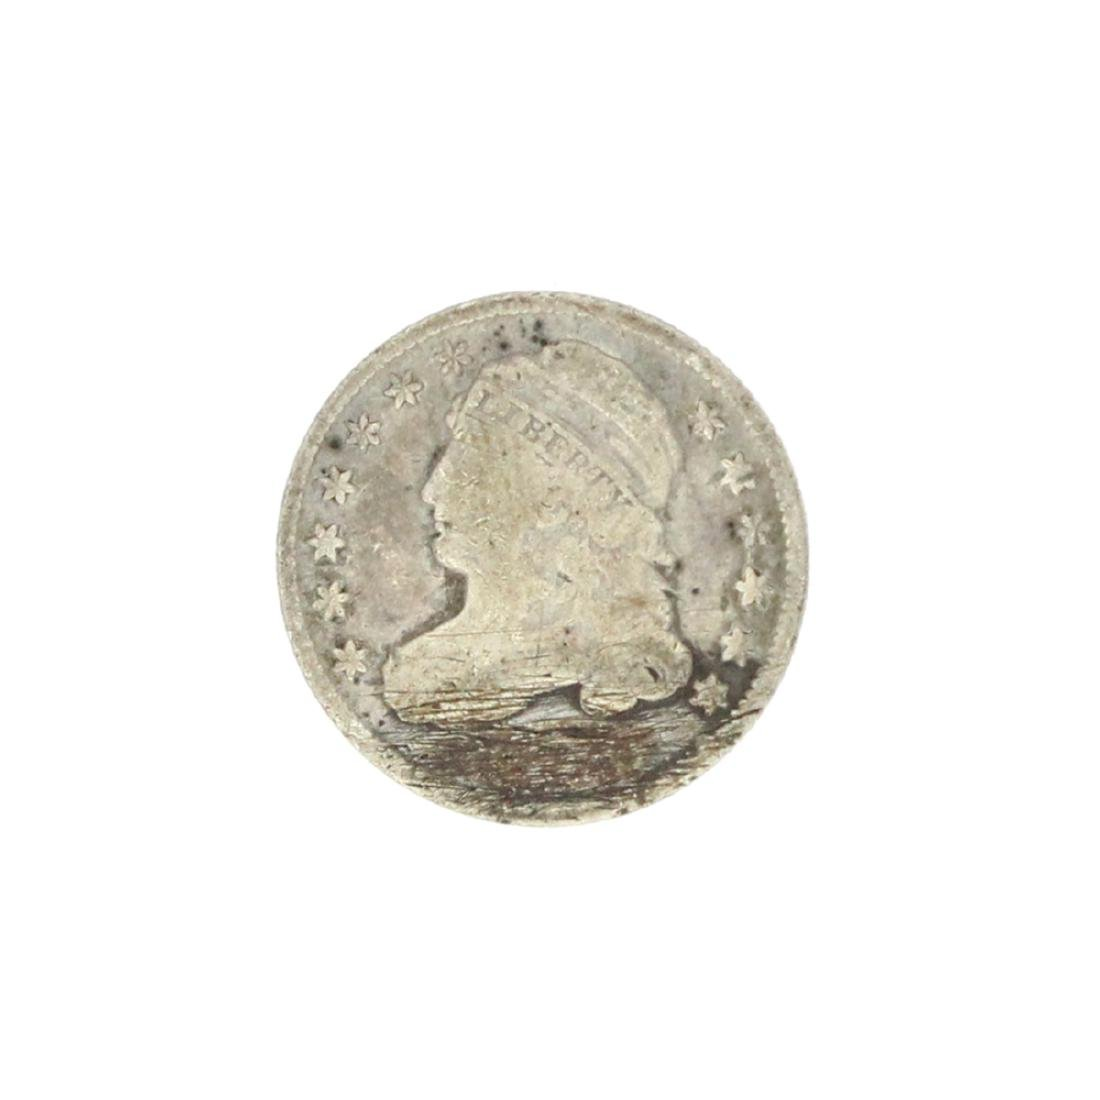 XXXX Capped Bust Dime Coin